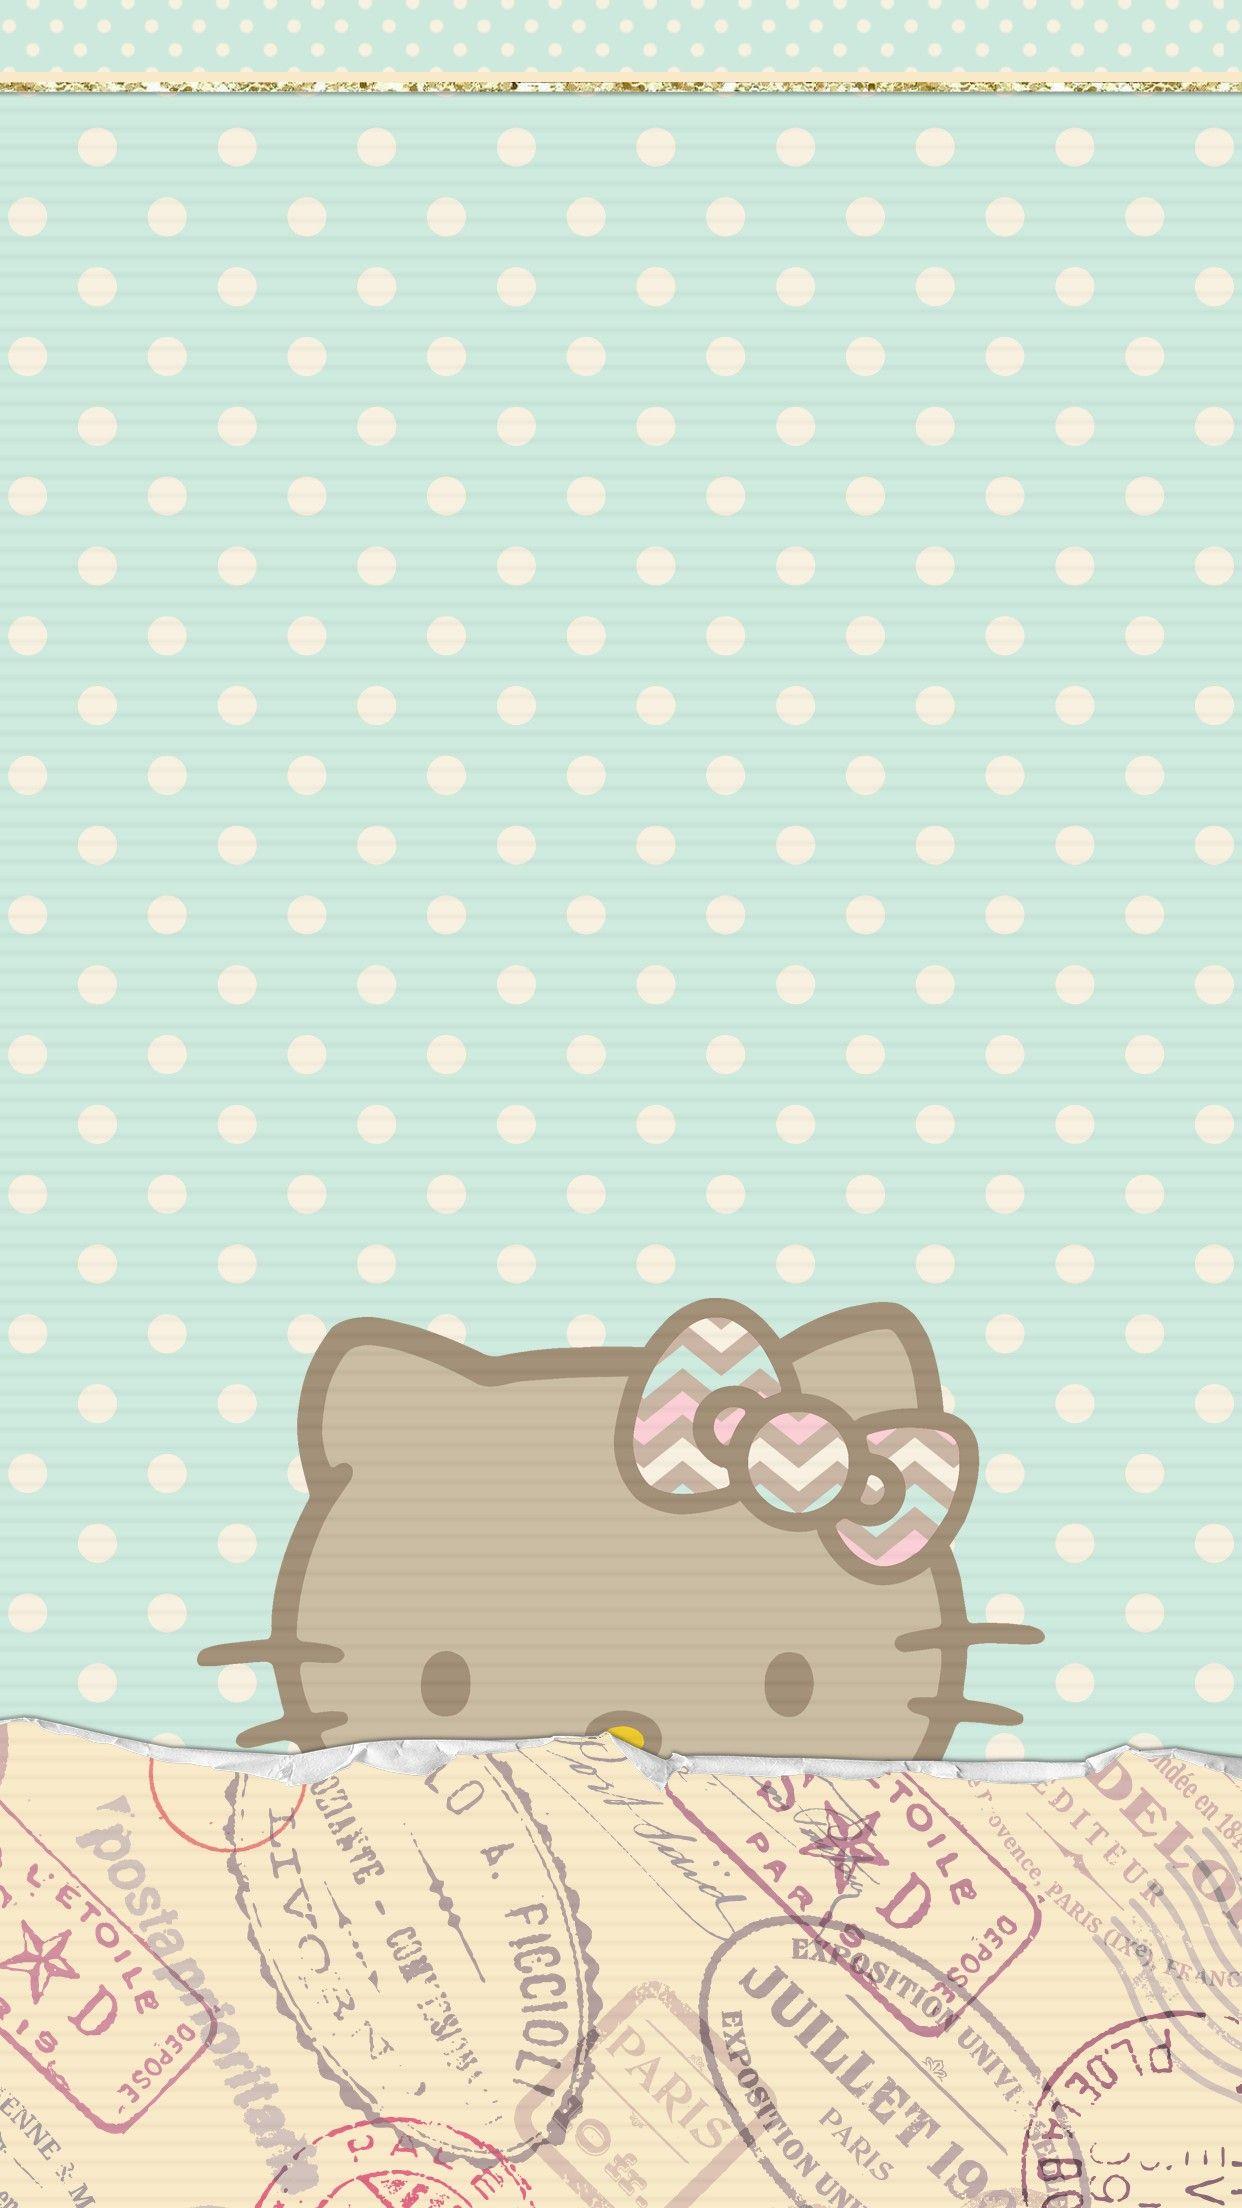 Wonderful Wallpaper Hello Kitty Pastel - 51ea509ecc75fd820b23ec2ff04c410a  Graphic_1007024.jpg